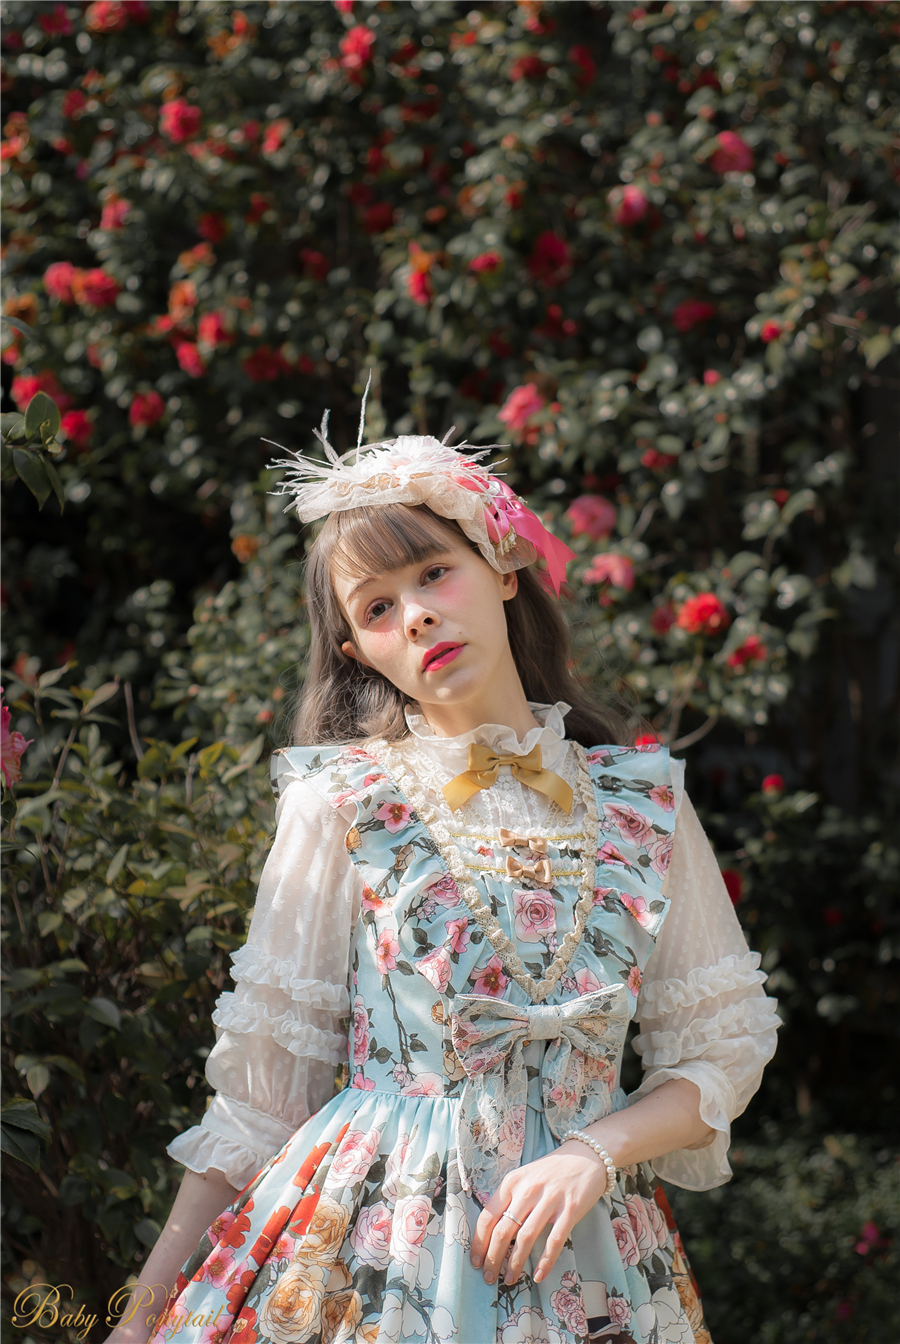 Baby Ponytail_Model Photo_Polly's Garden of Dreams_JSK Sky_Claudia10.jpg